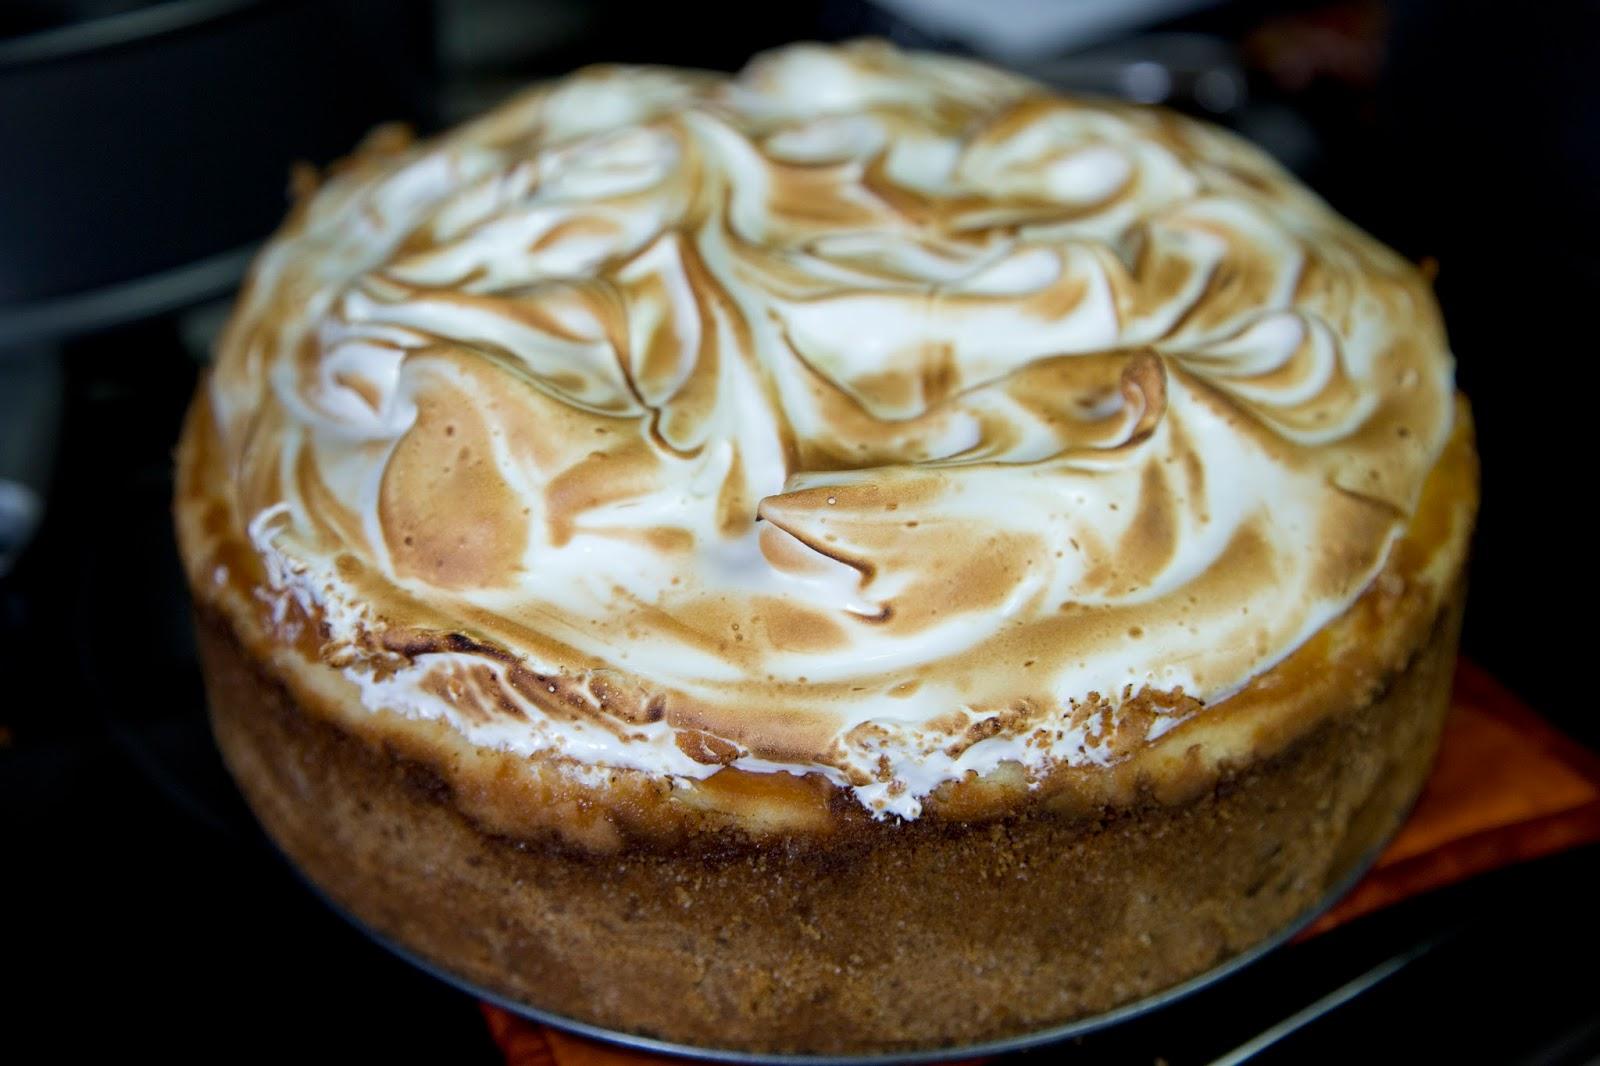 Nonesuch: Lemon Meringue Cheesecake